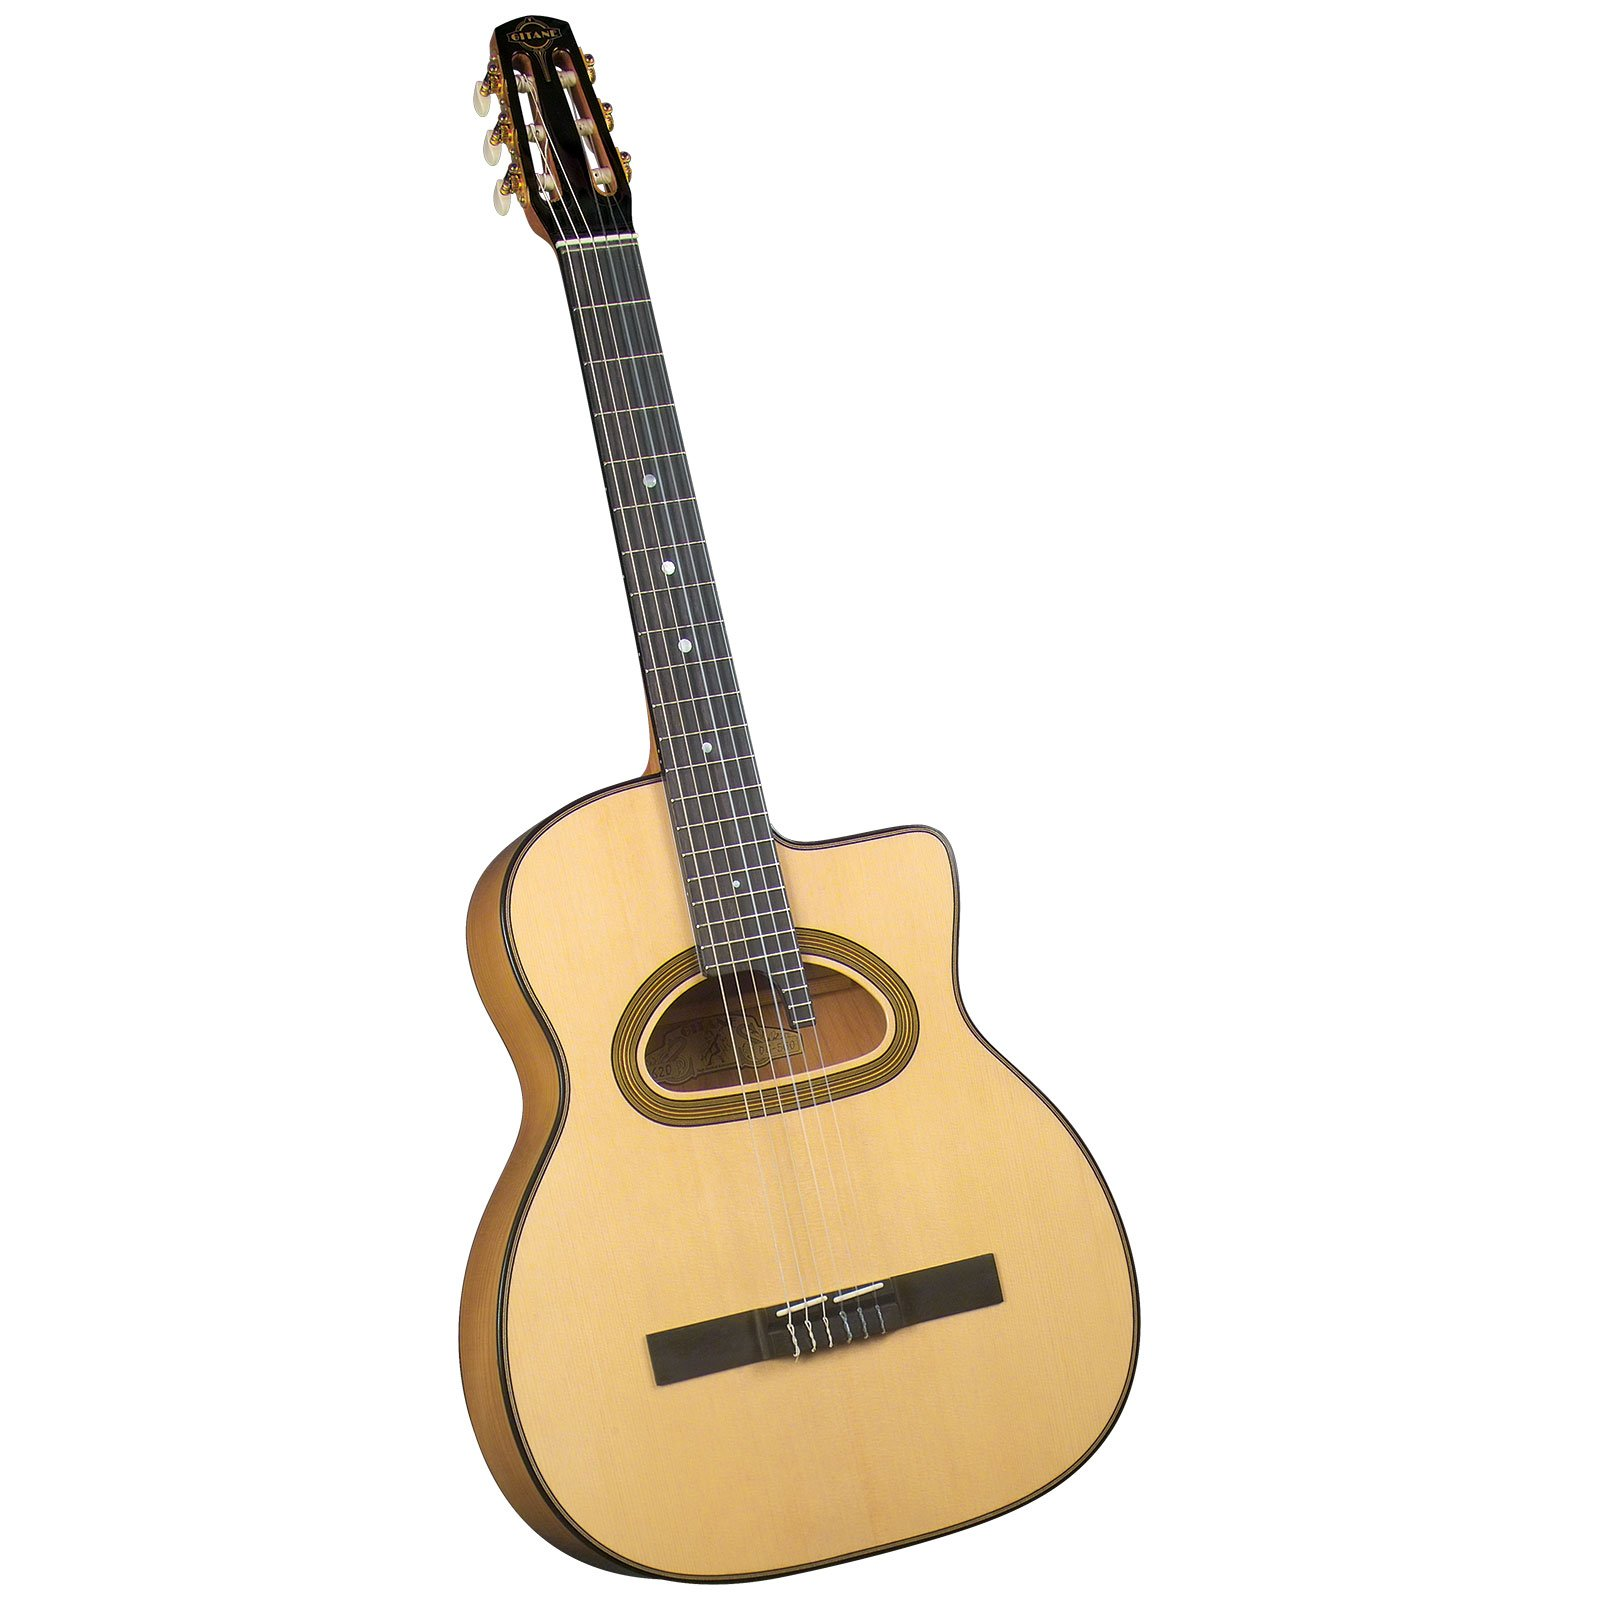 Gitane DG-560 Professional Nylon String Flamenco/Gypsy Jazz Guitar